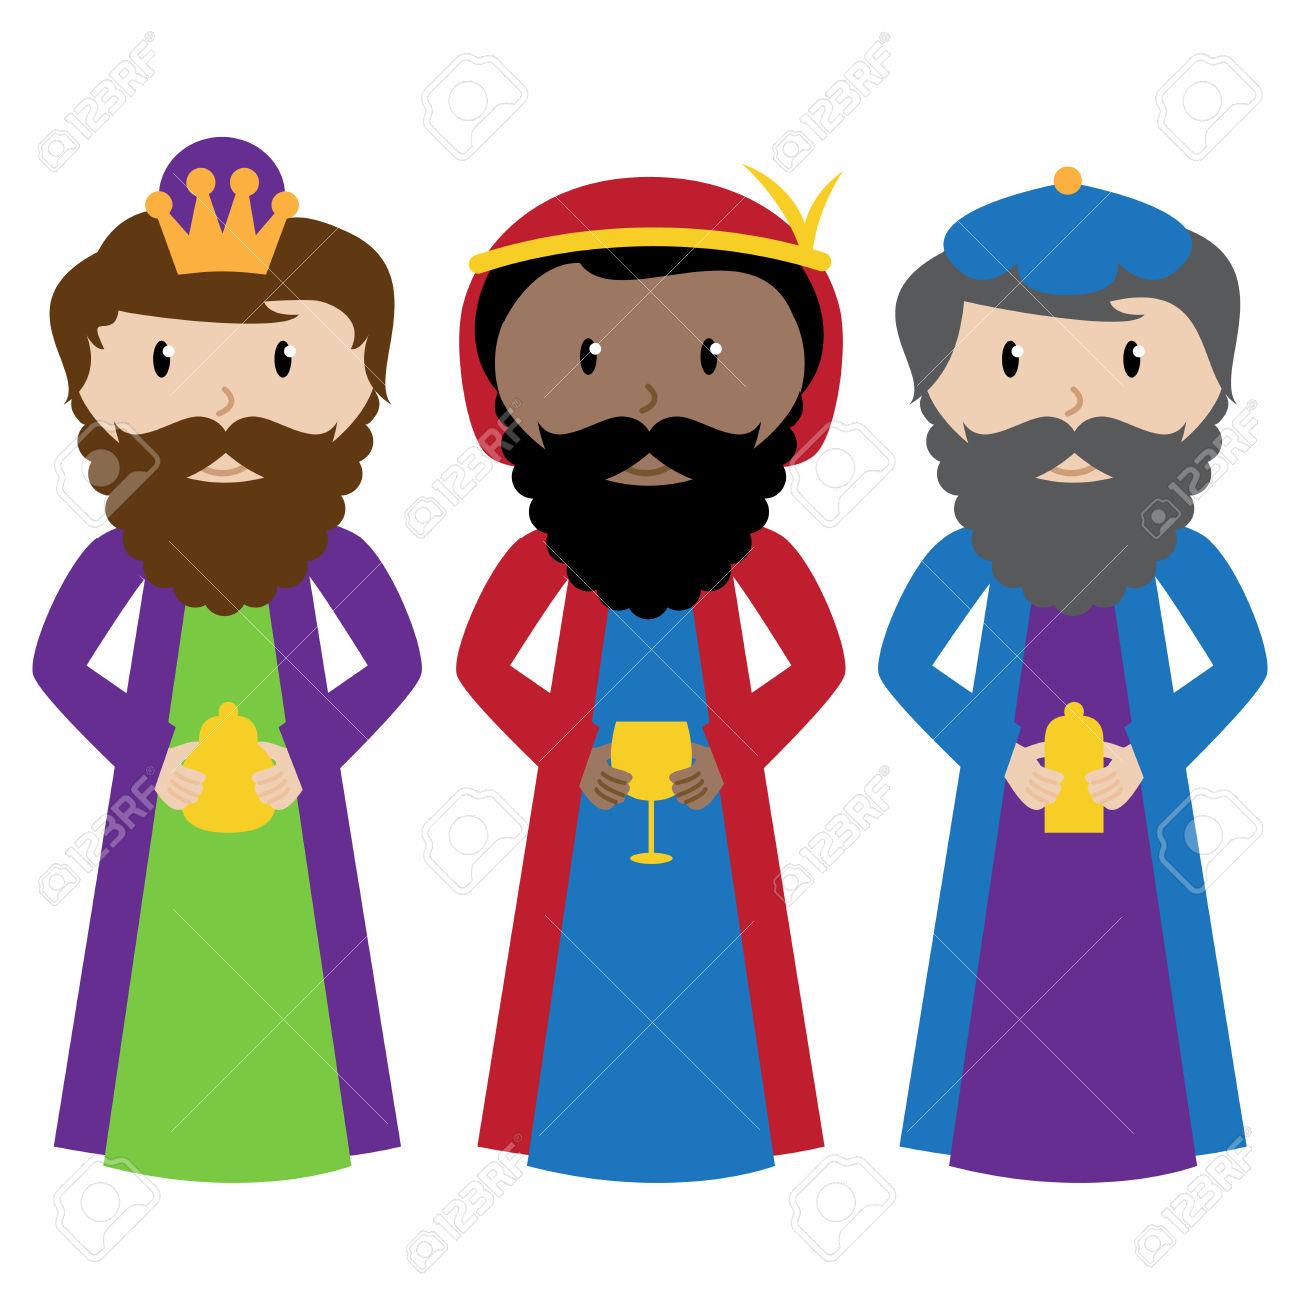 clipart reyes magos #13